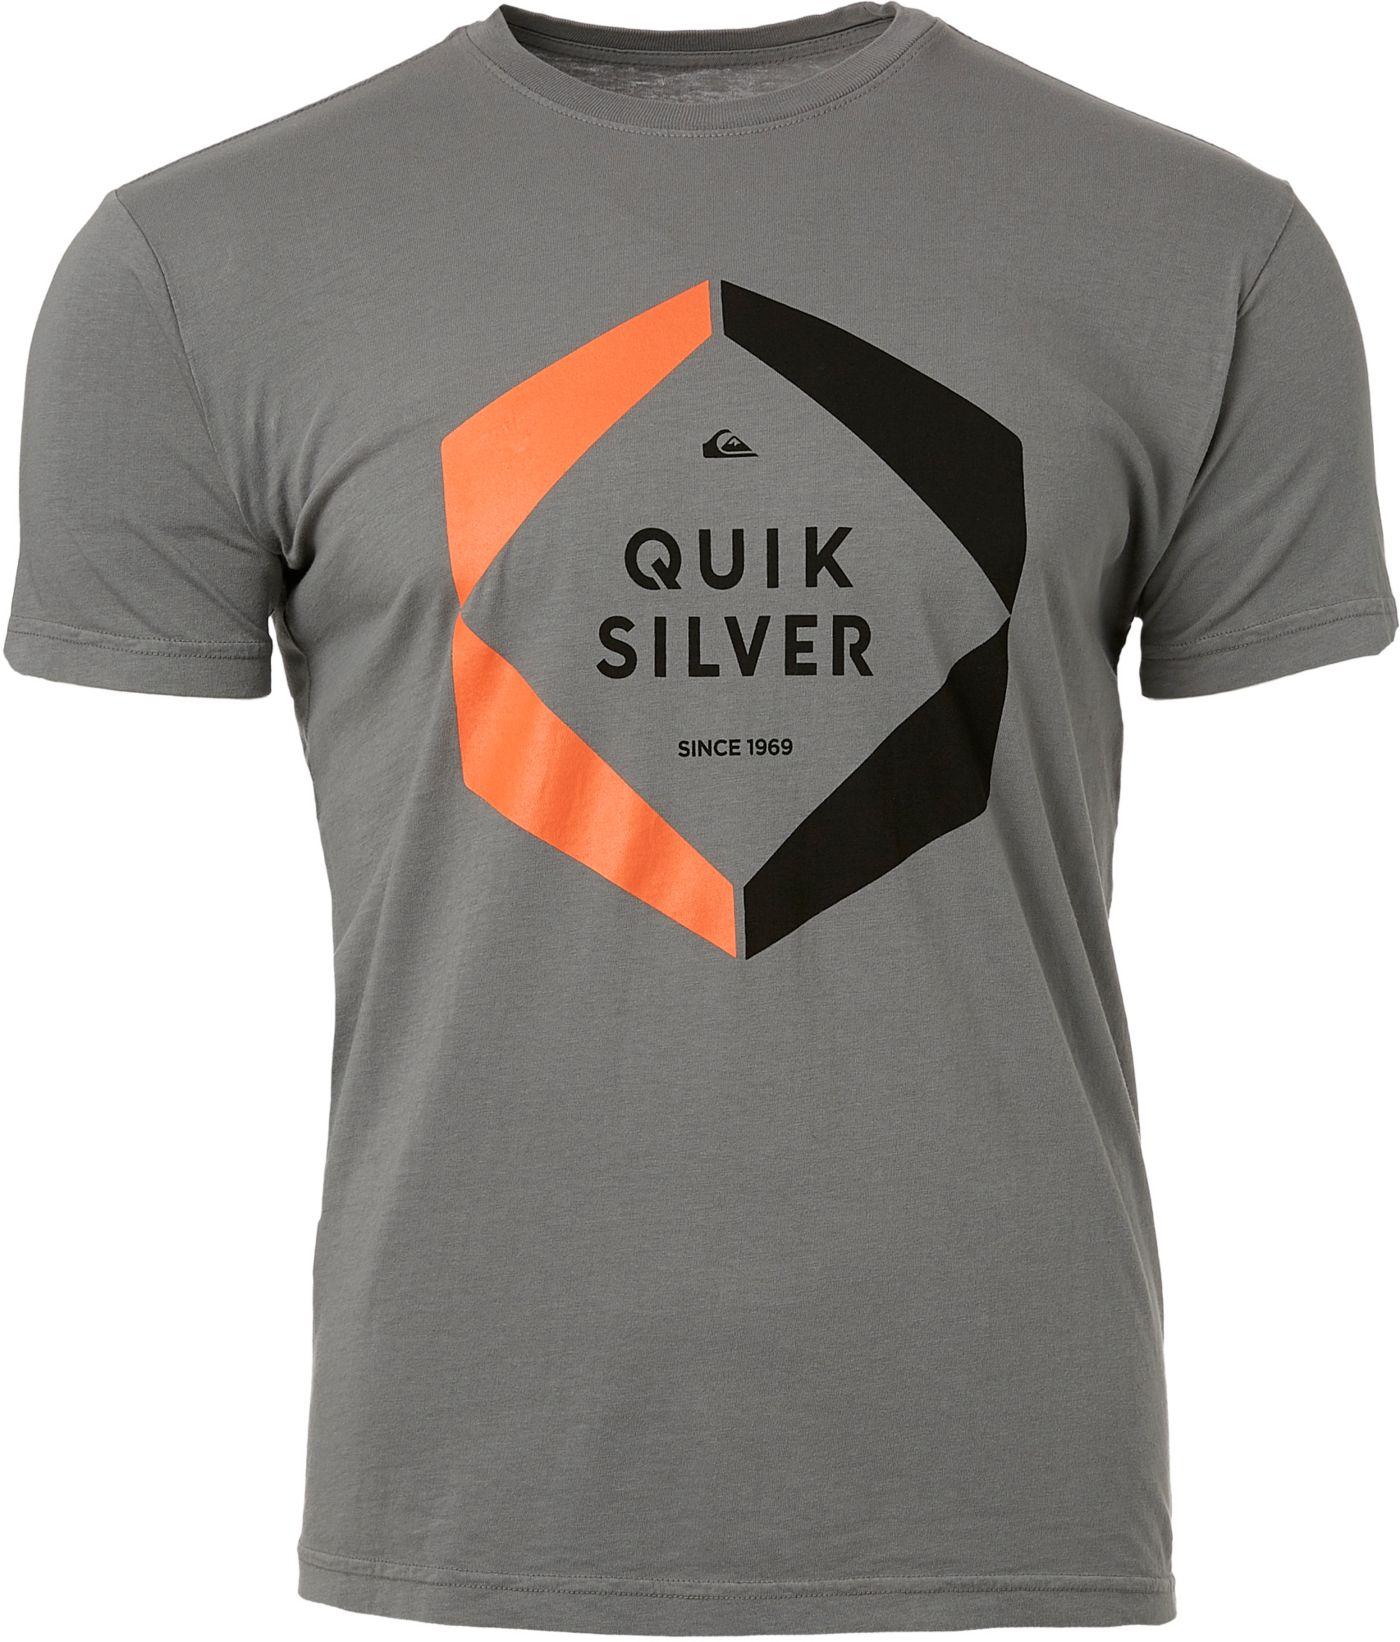 Quiksilver Men's Hexa Logo Short Sleeve T-Shirt